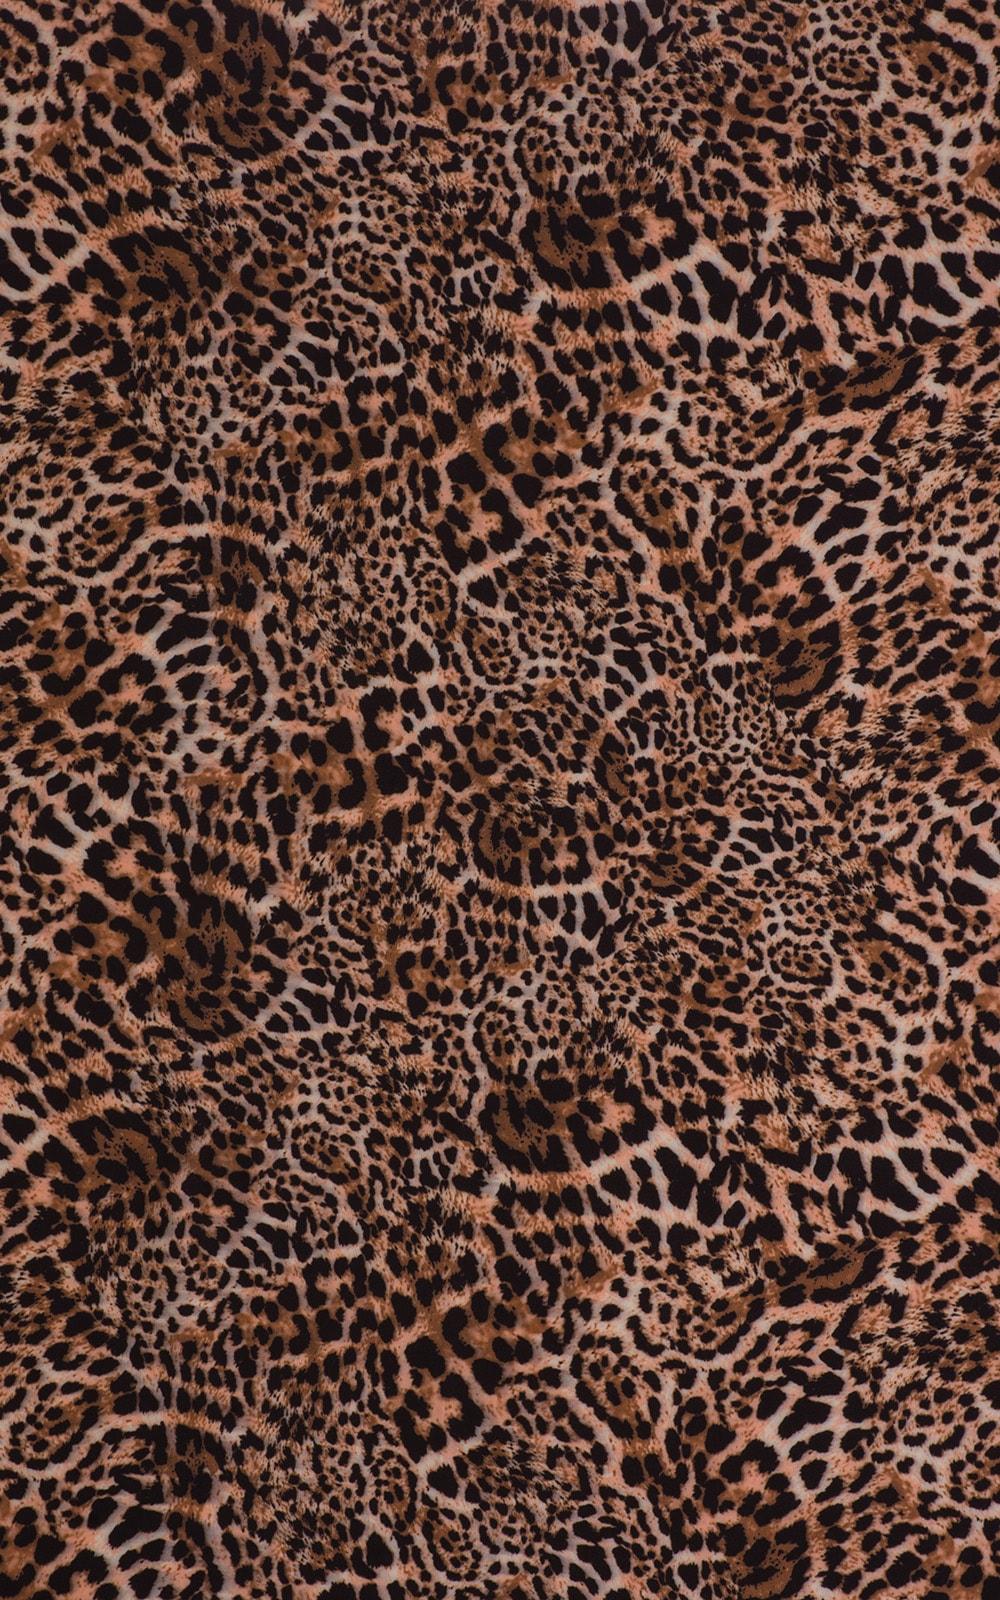 Brazilian Triangle Top in Super ThinSKINZ Cheeta Fabric